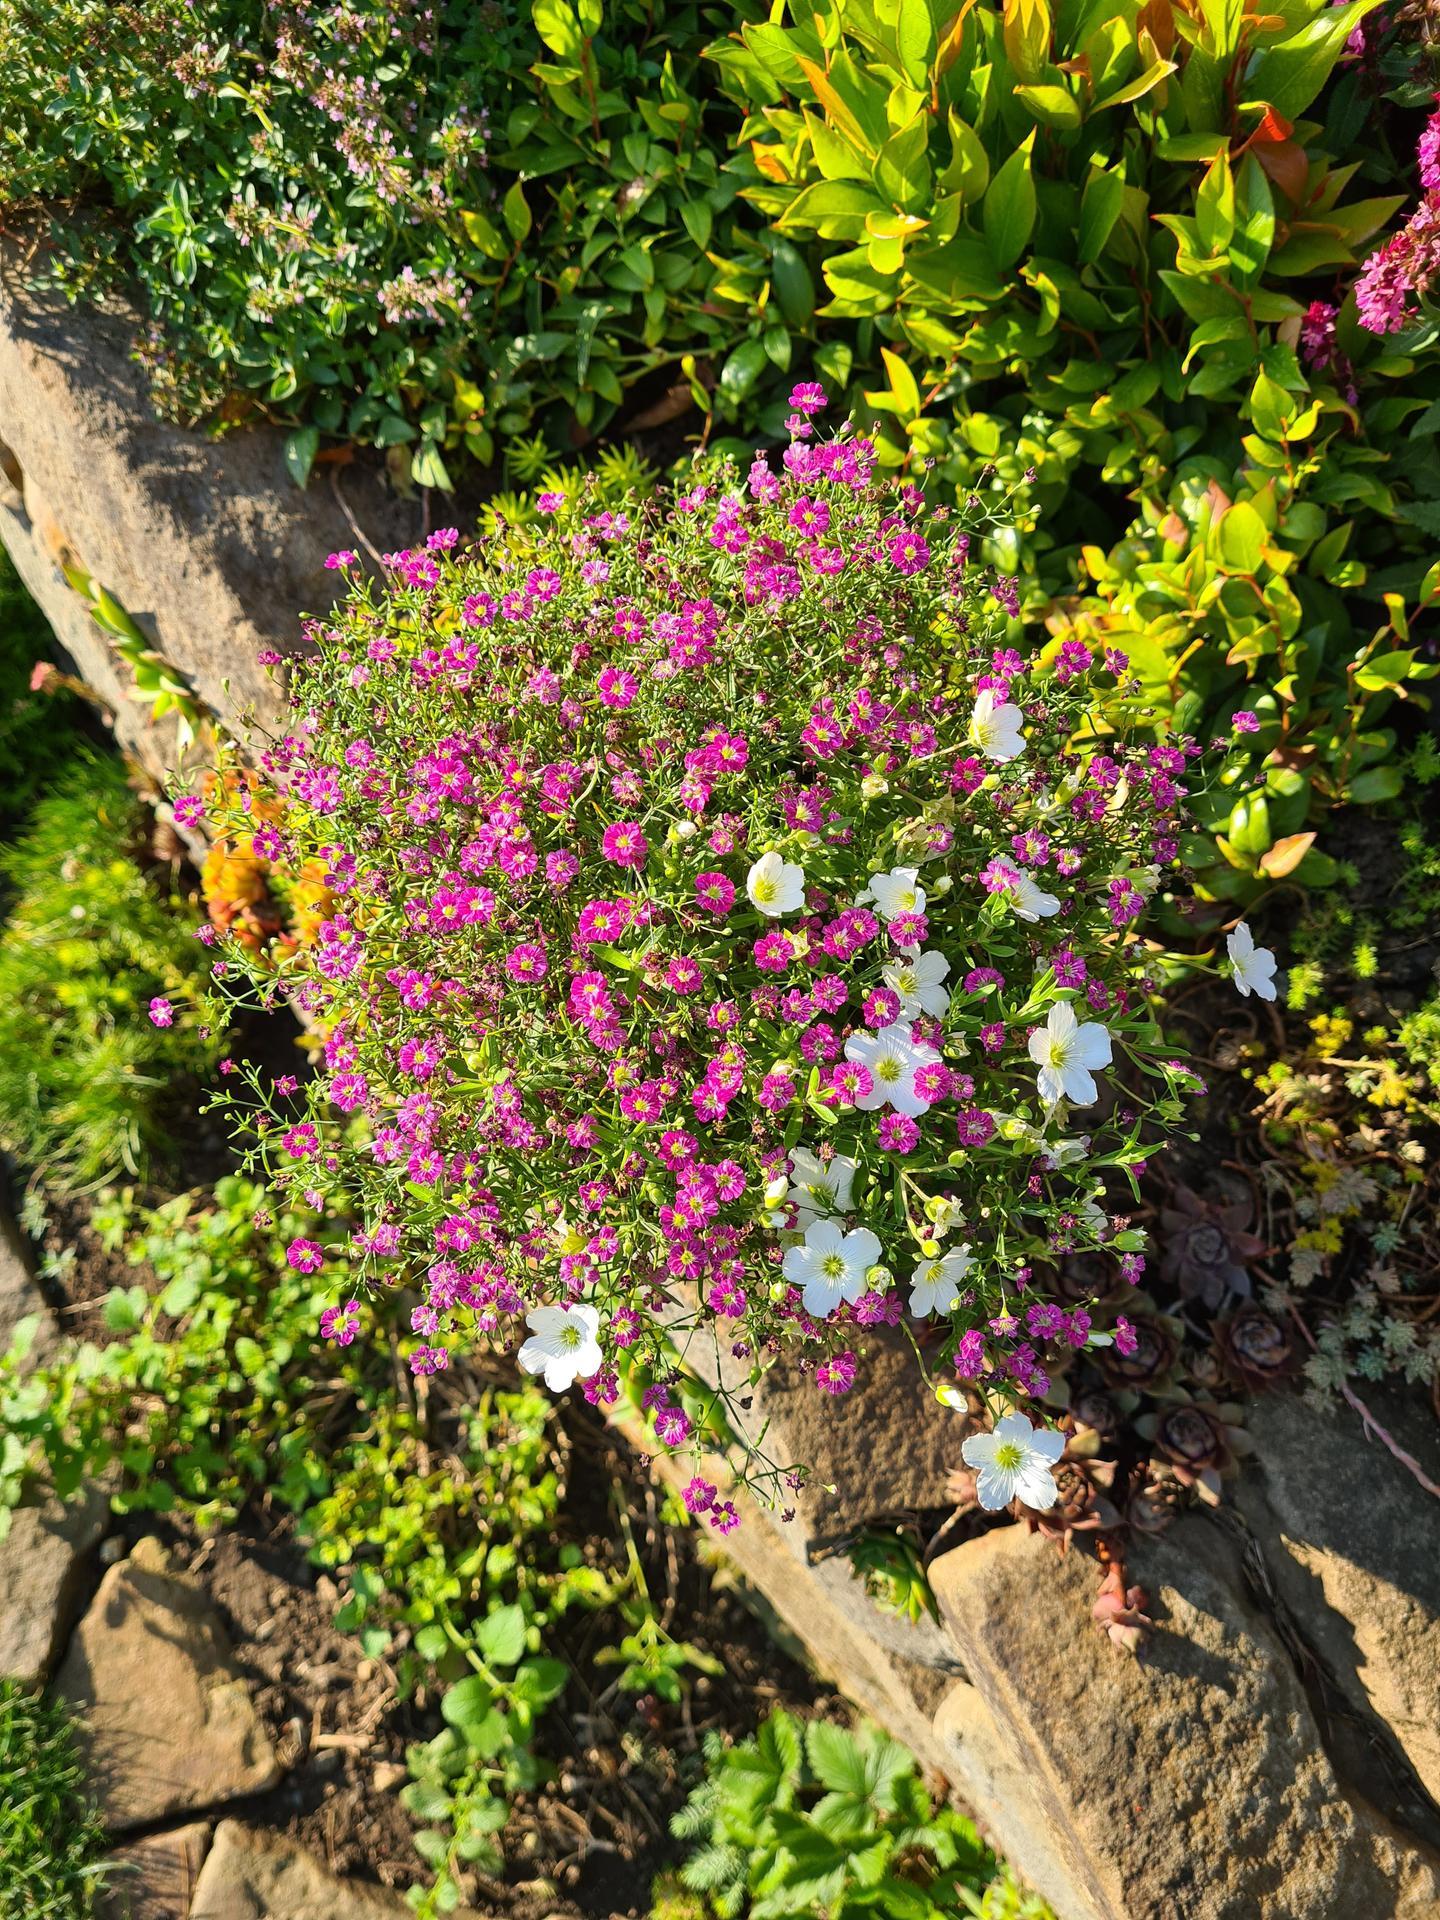 Naša záhradka 2021 - gypsophila plus cosi biele, dnes kupene v kvetinaci